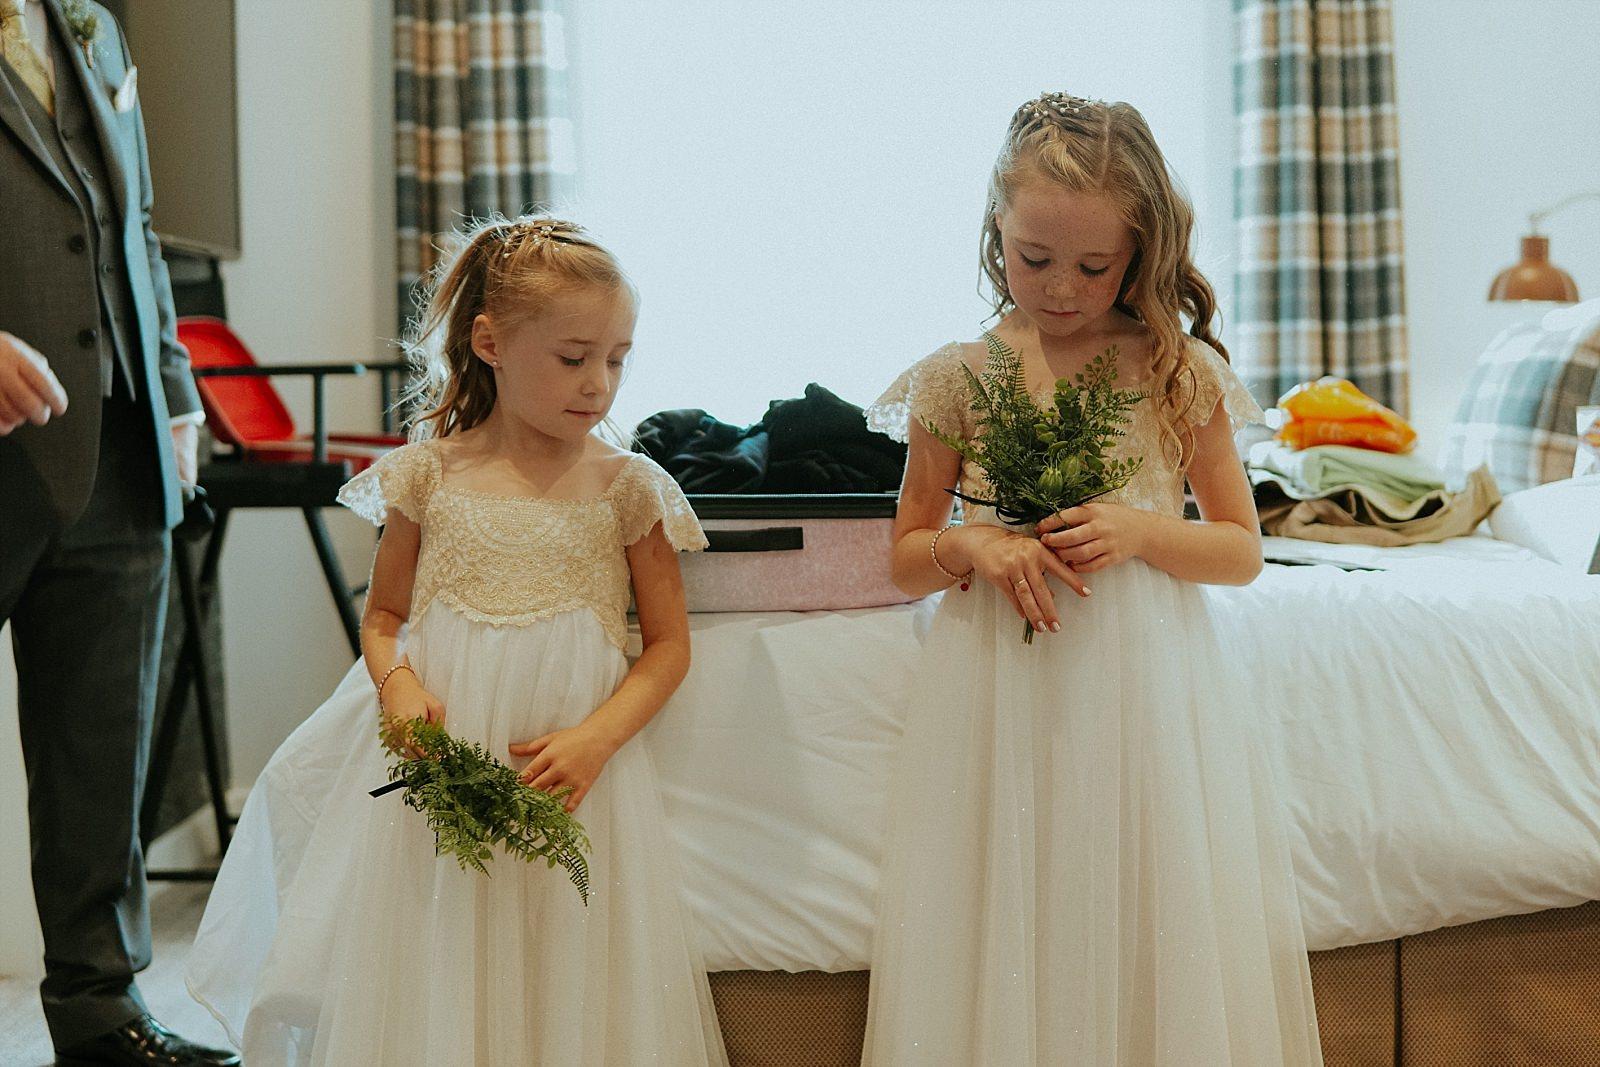 cute bridesmaid in white dresses